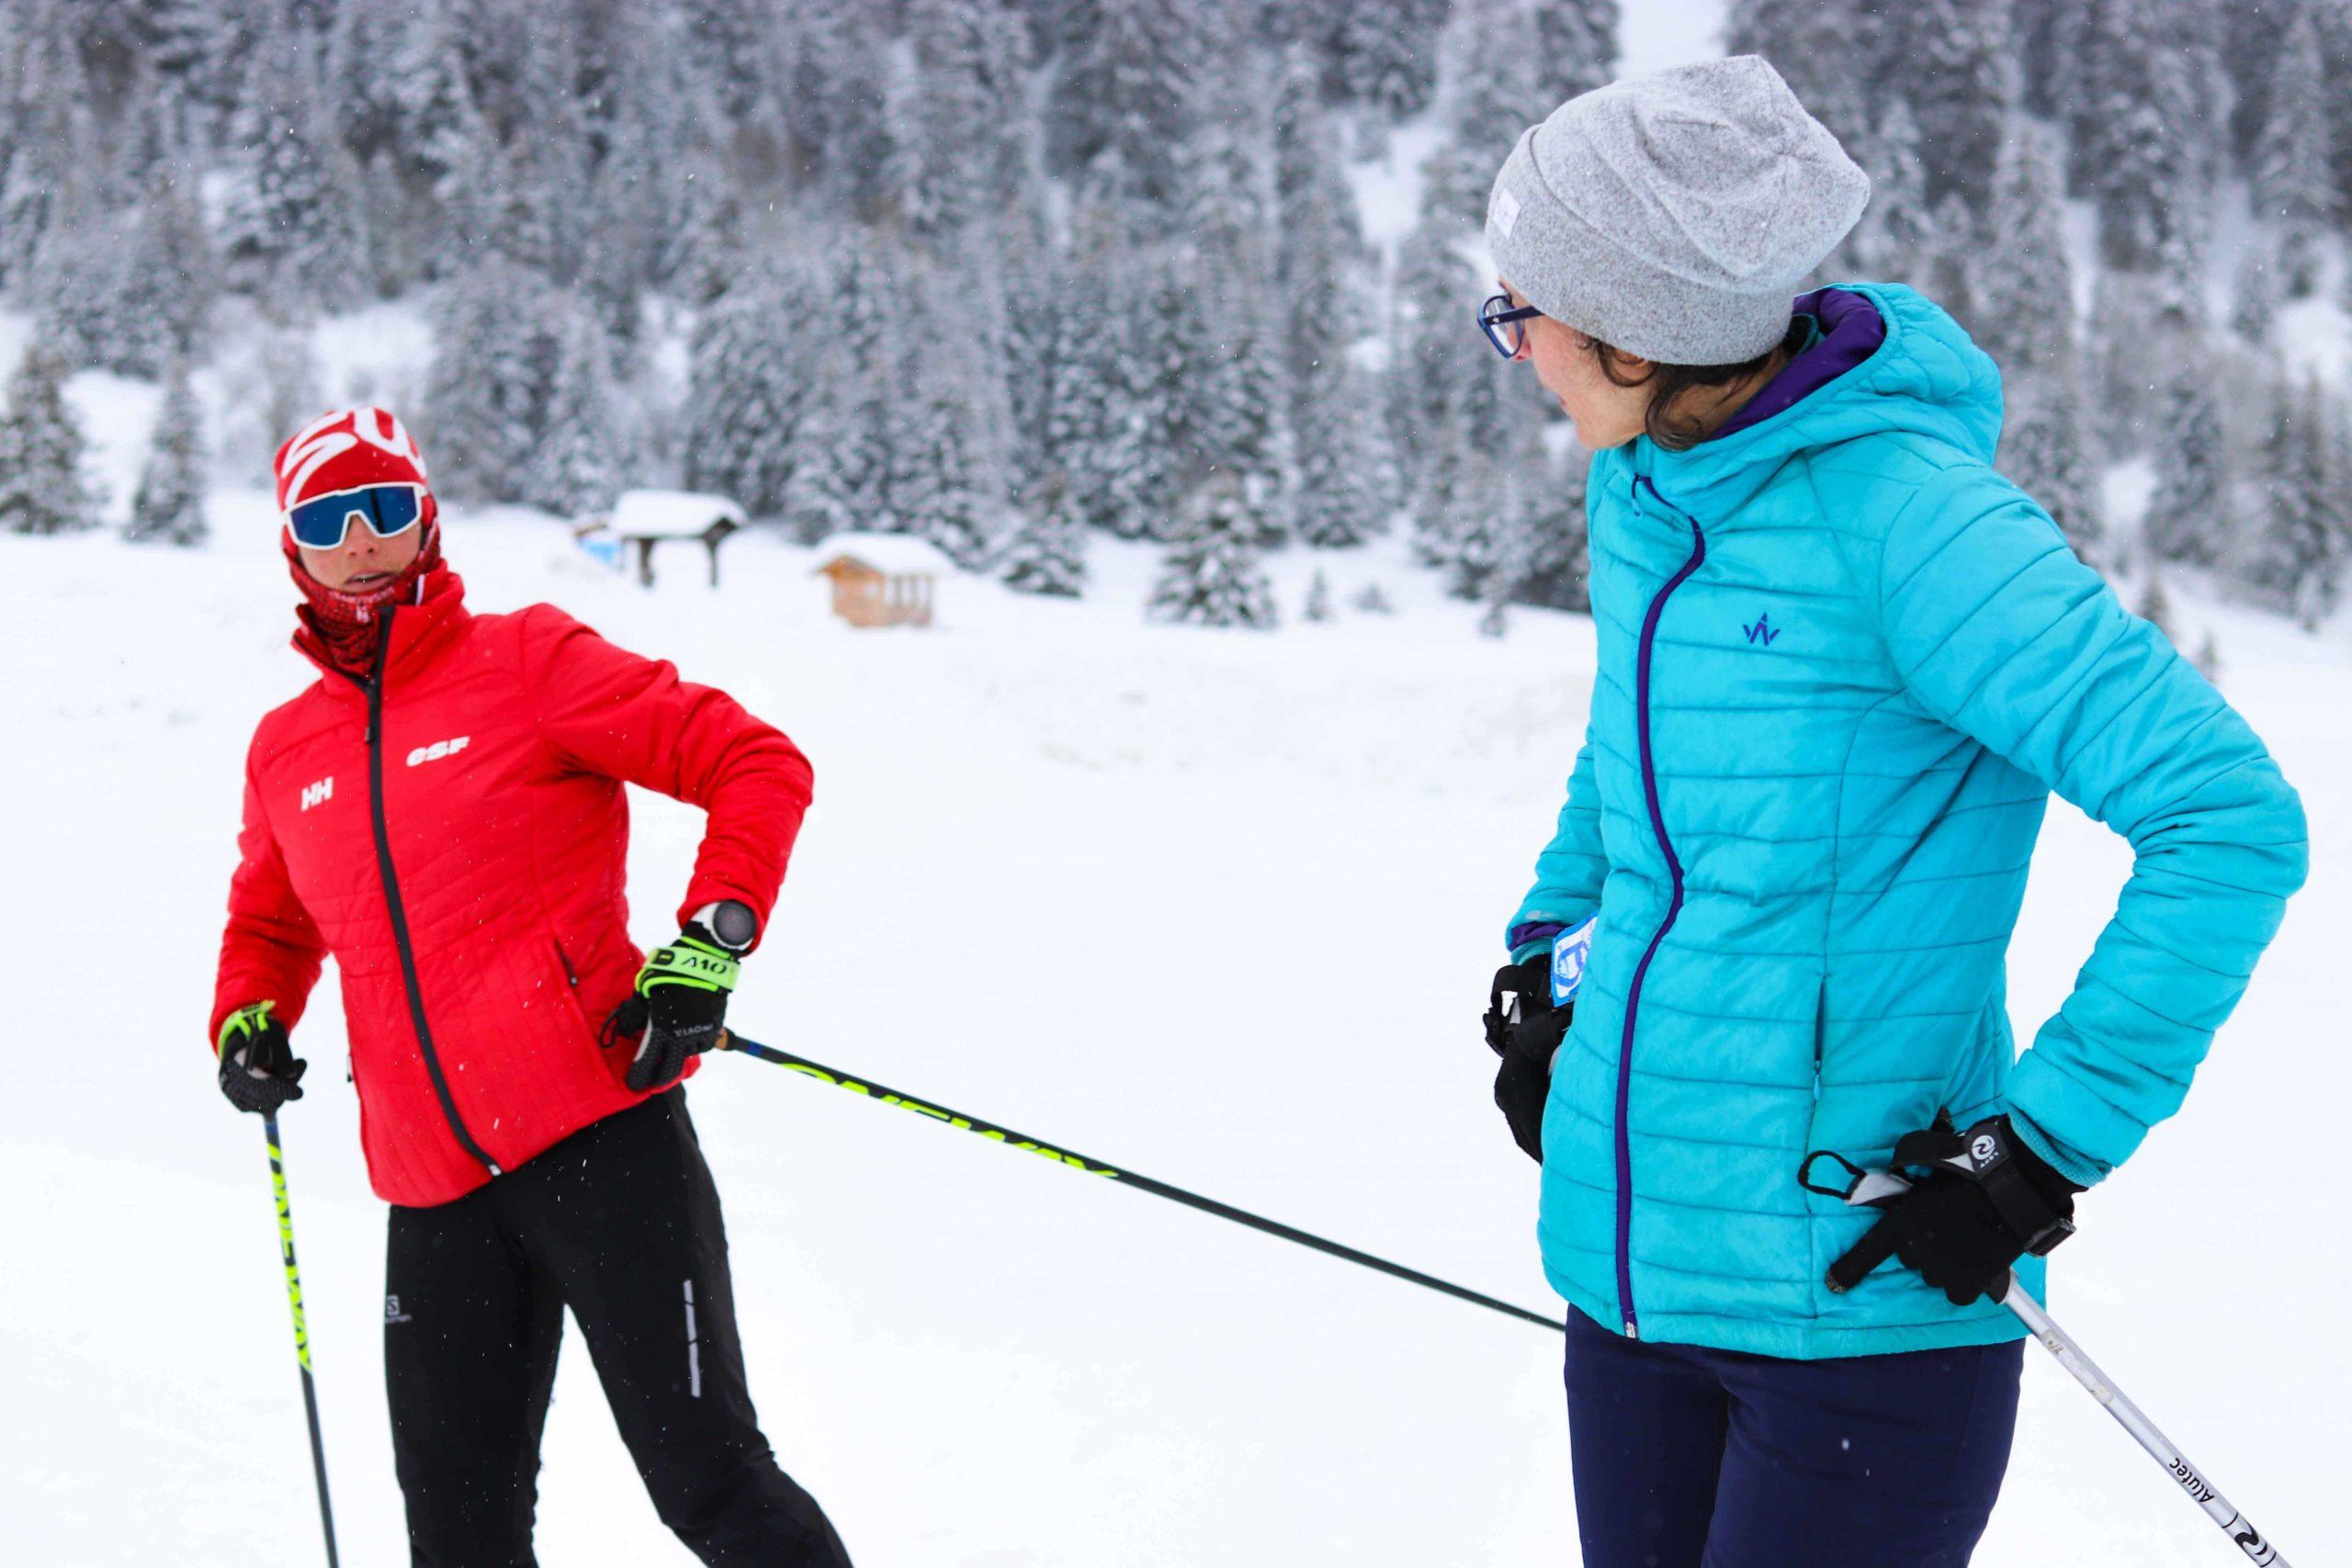 Marie Kromer, ecole de ski de fond - skating Sommand